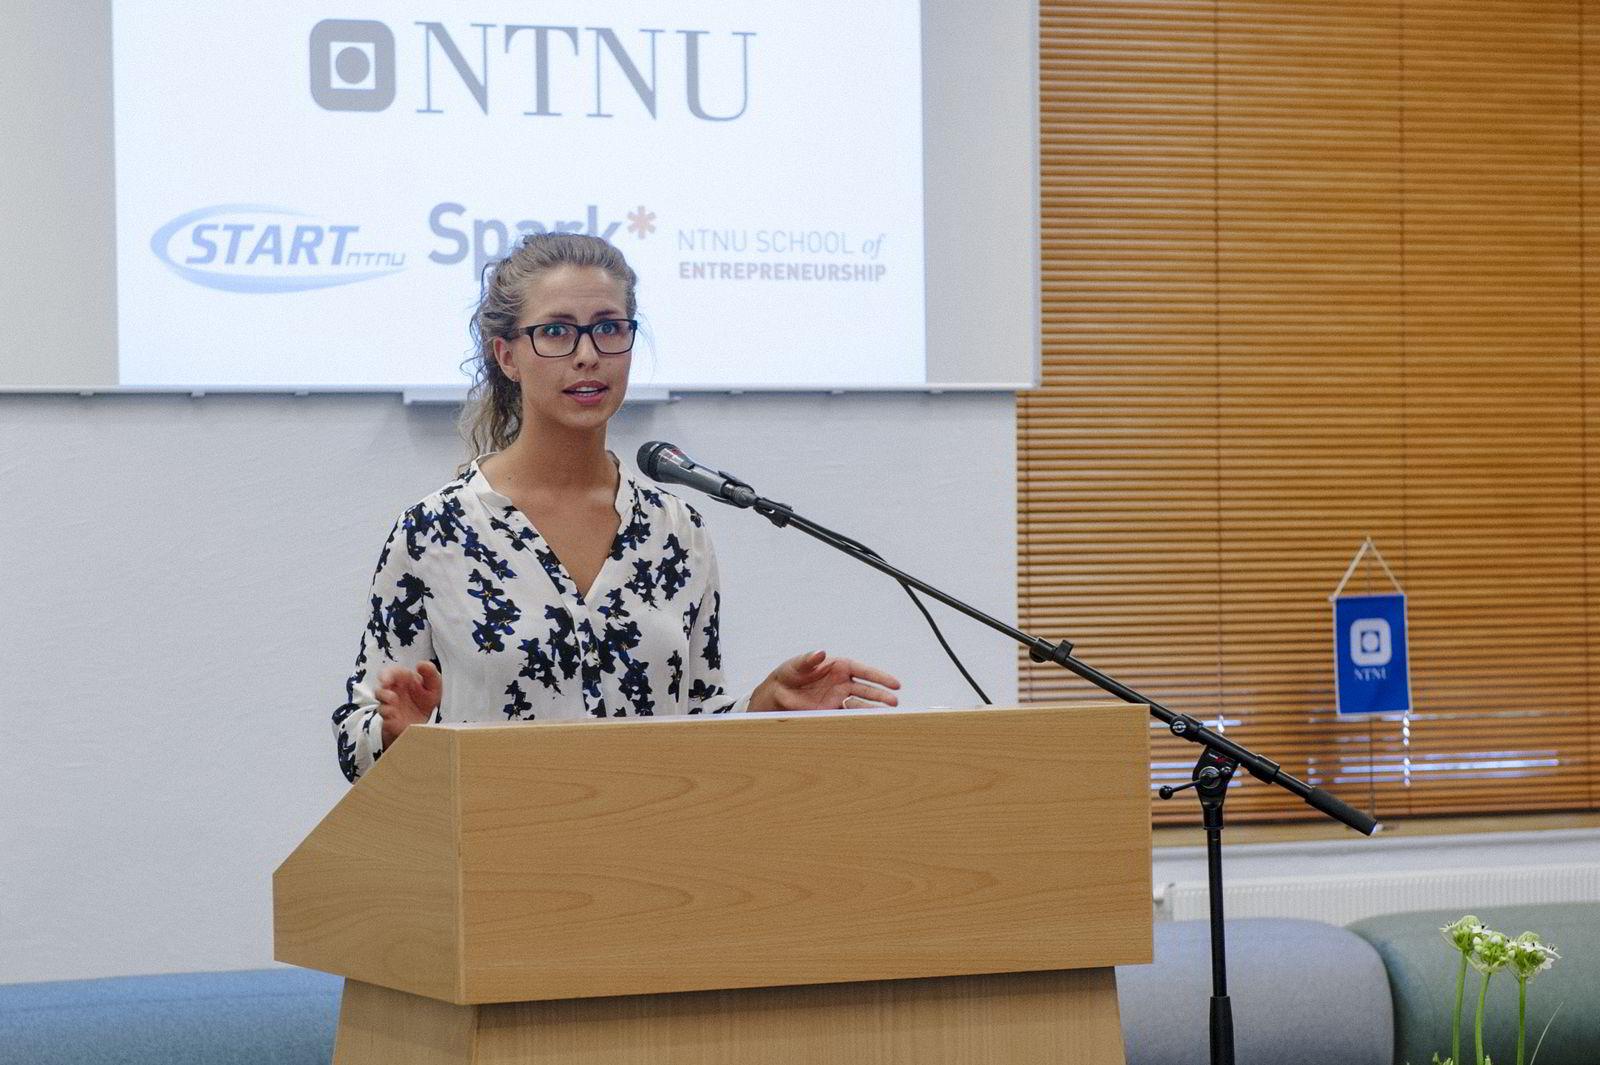 Masterstudent Nina Heir ved Entreprenørskolen på NTNU i Trondheim presenterer sin bedriftsidé.